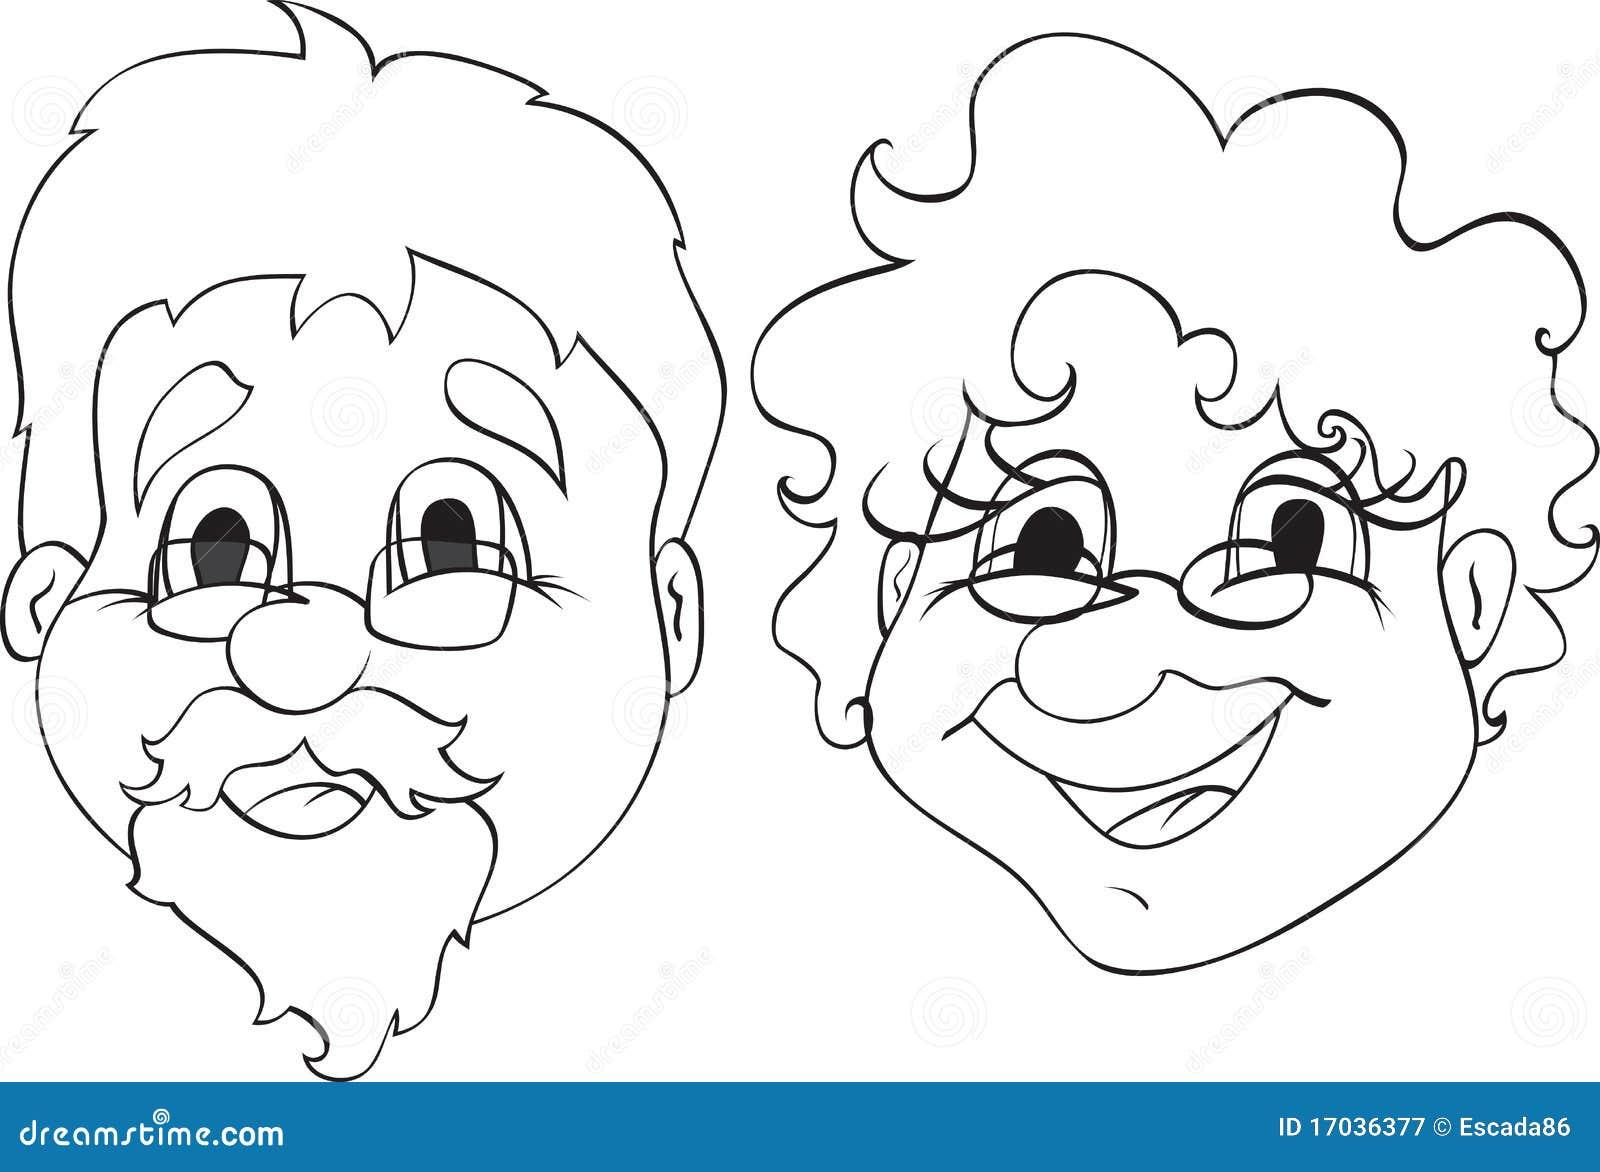 grandpa and grandma royalty free stock photography image 17036377